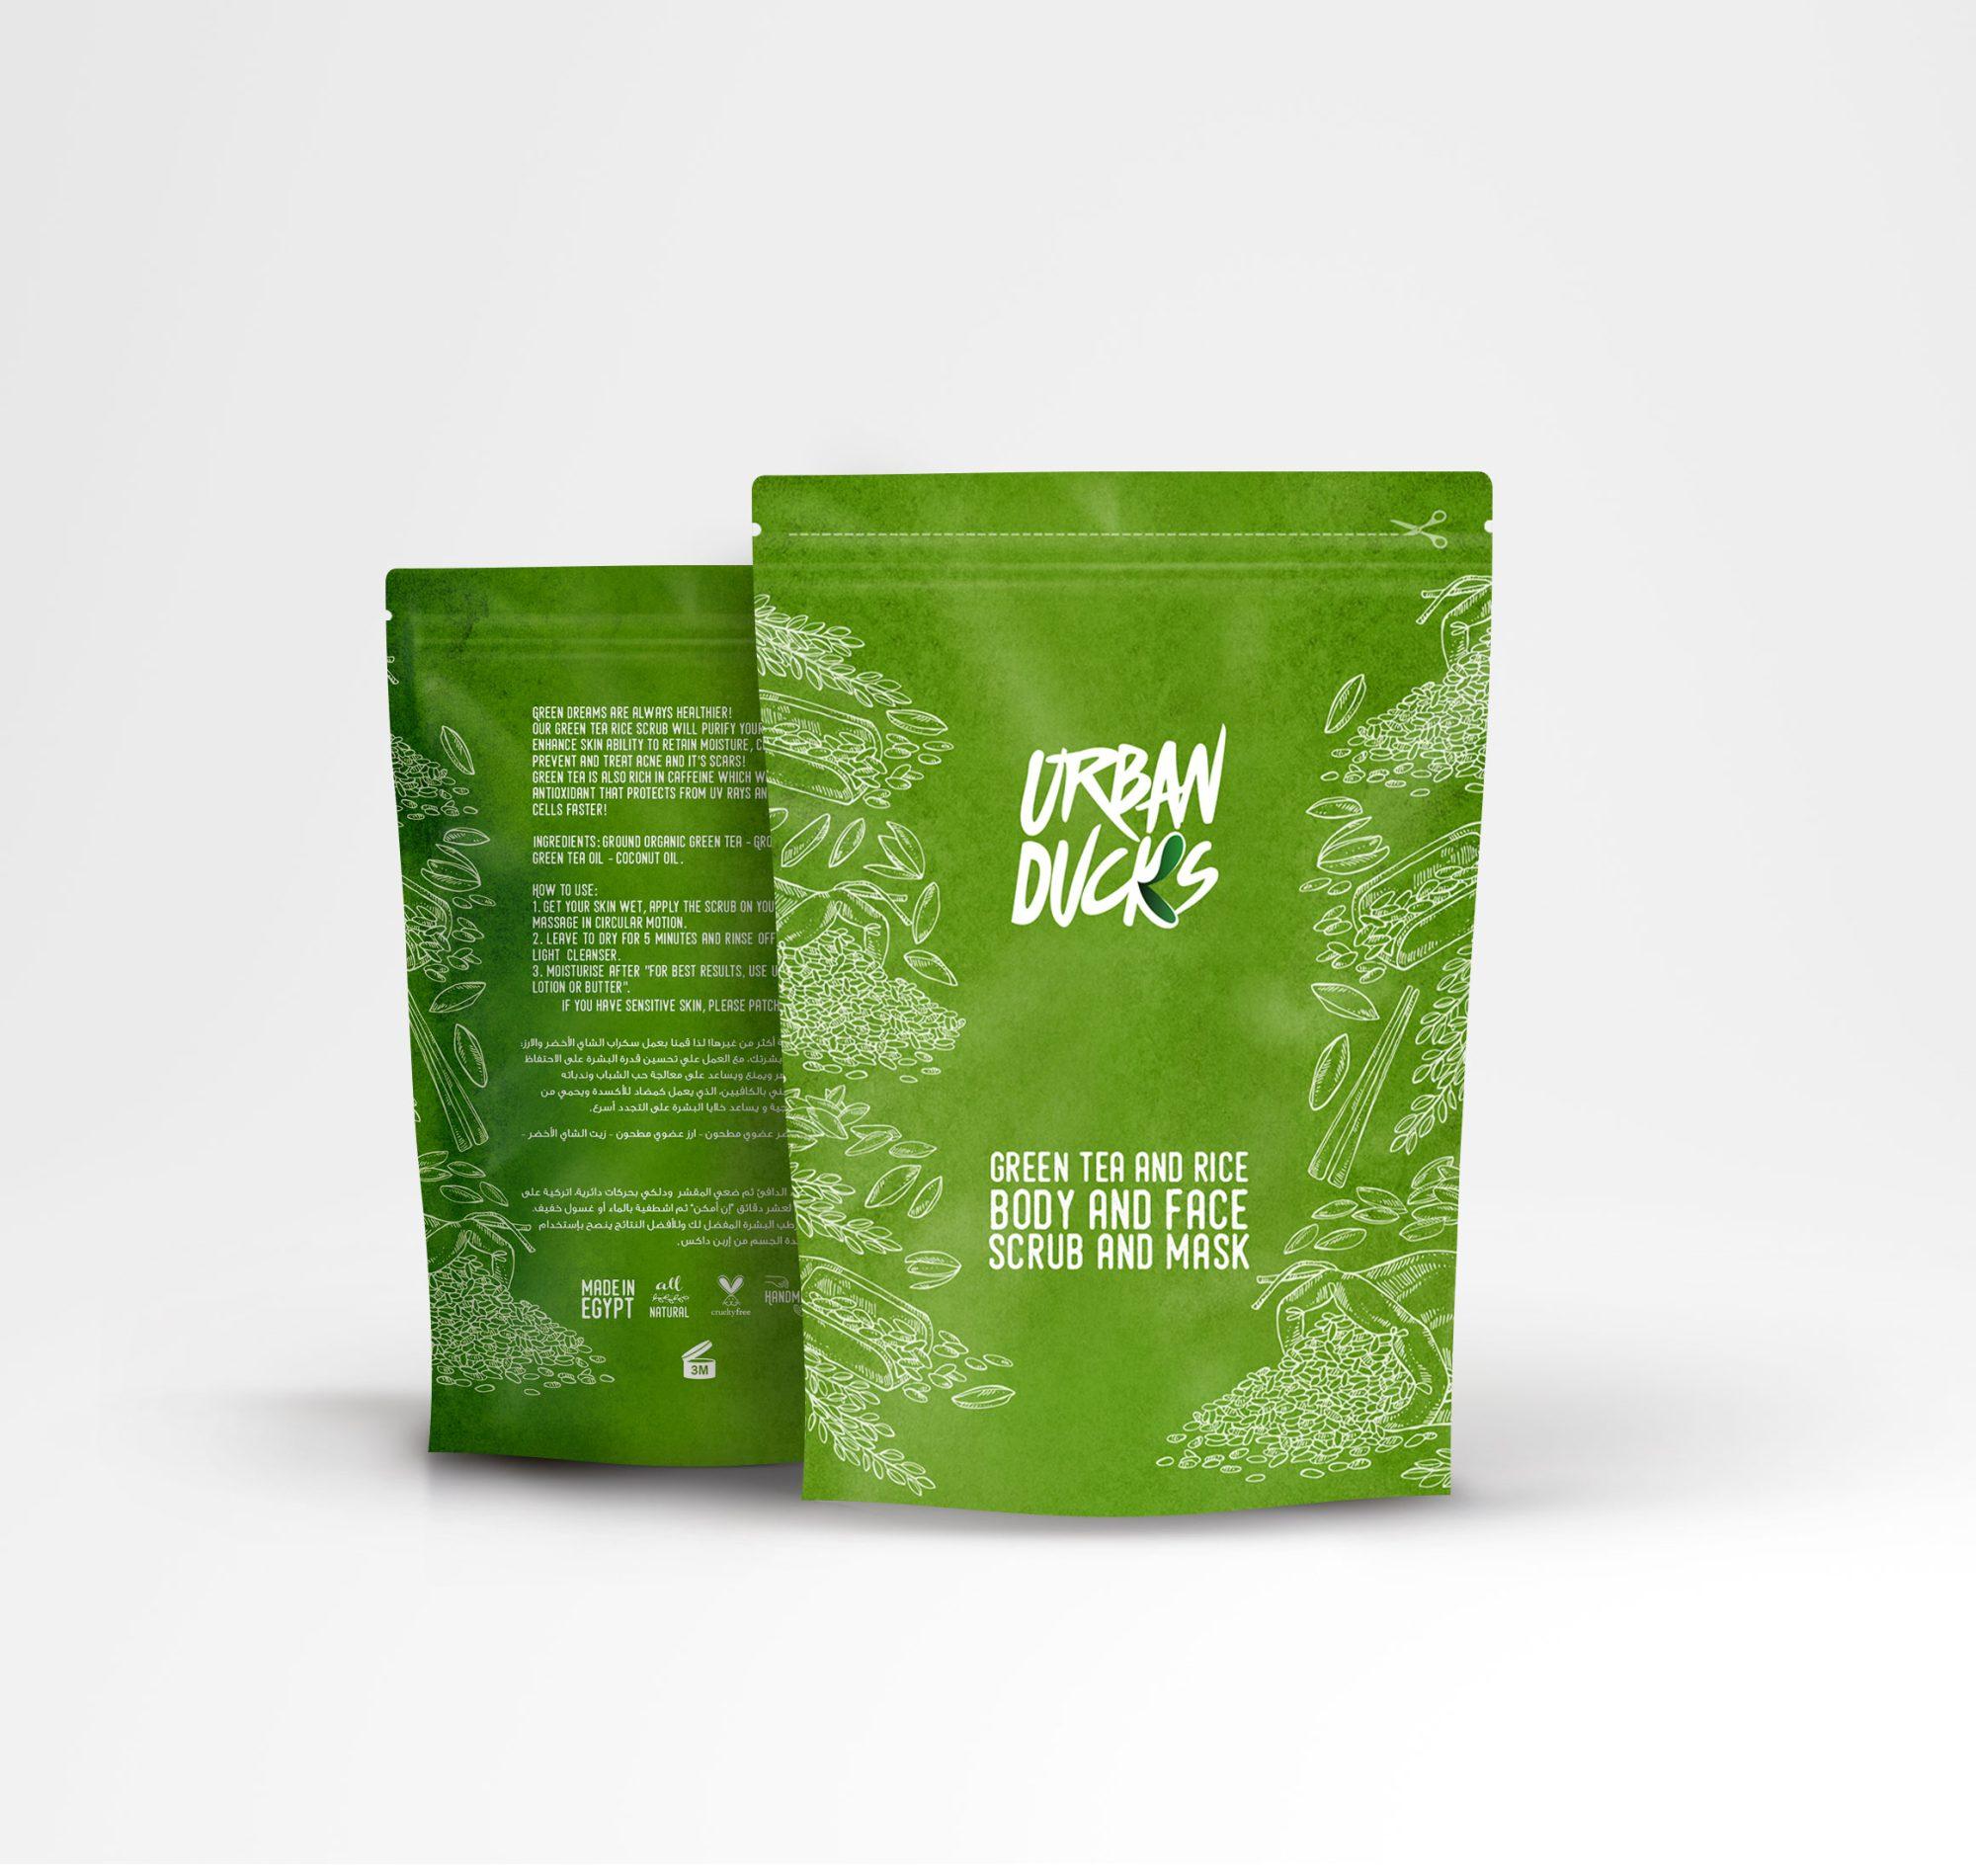 Green Tea & Rice Face Mask And Body Scrub